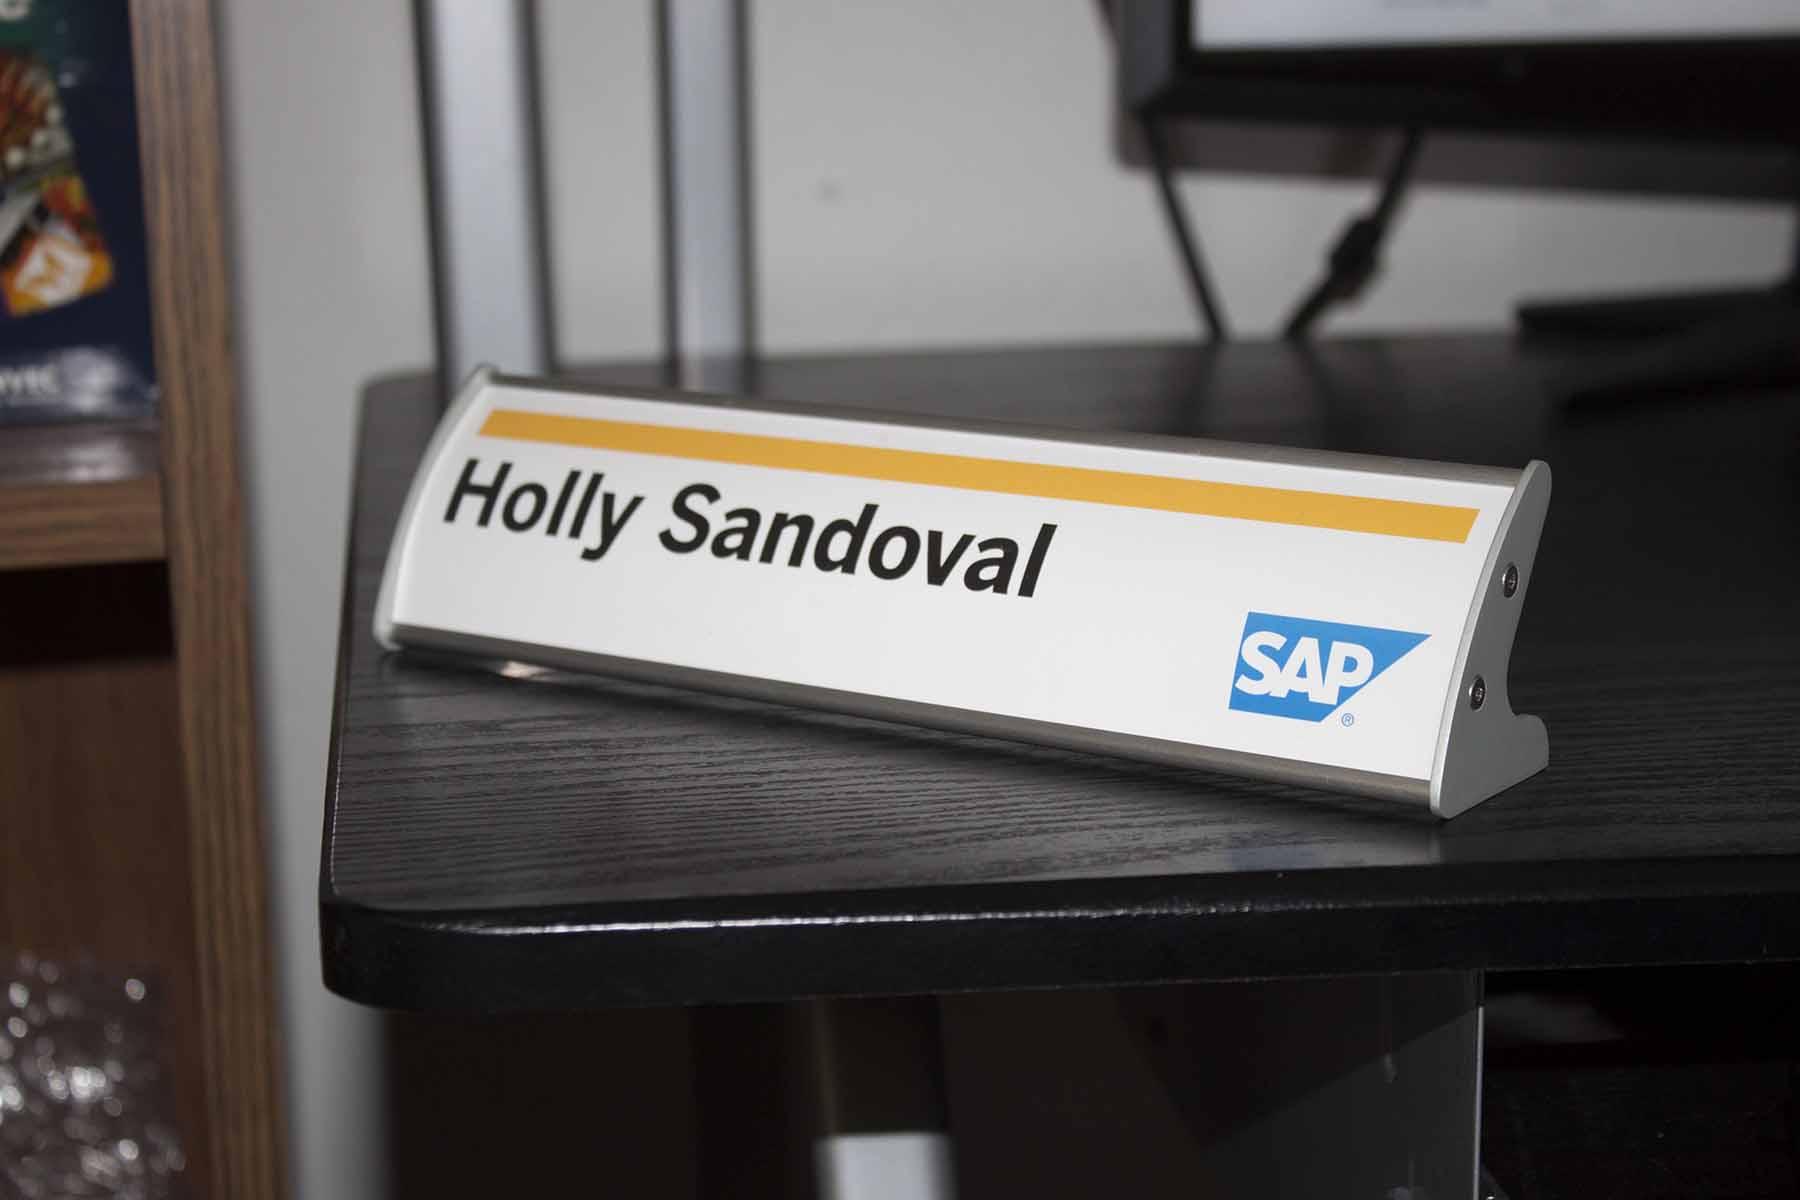 SAP Nameplate